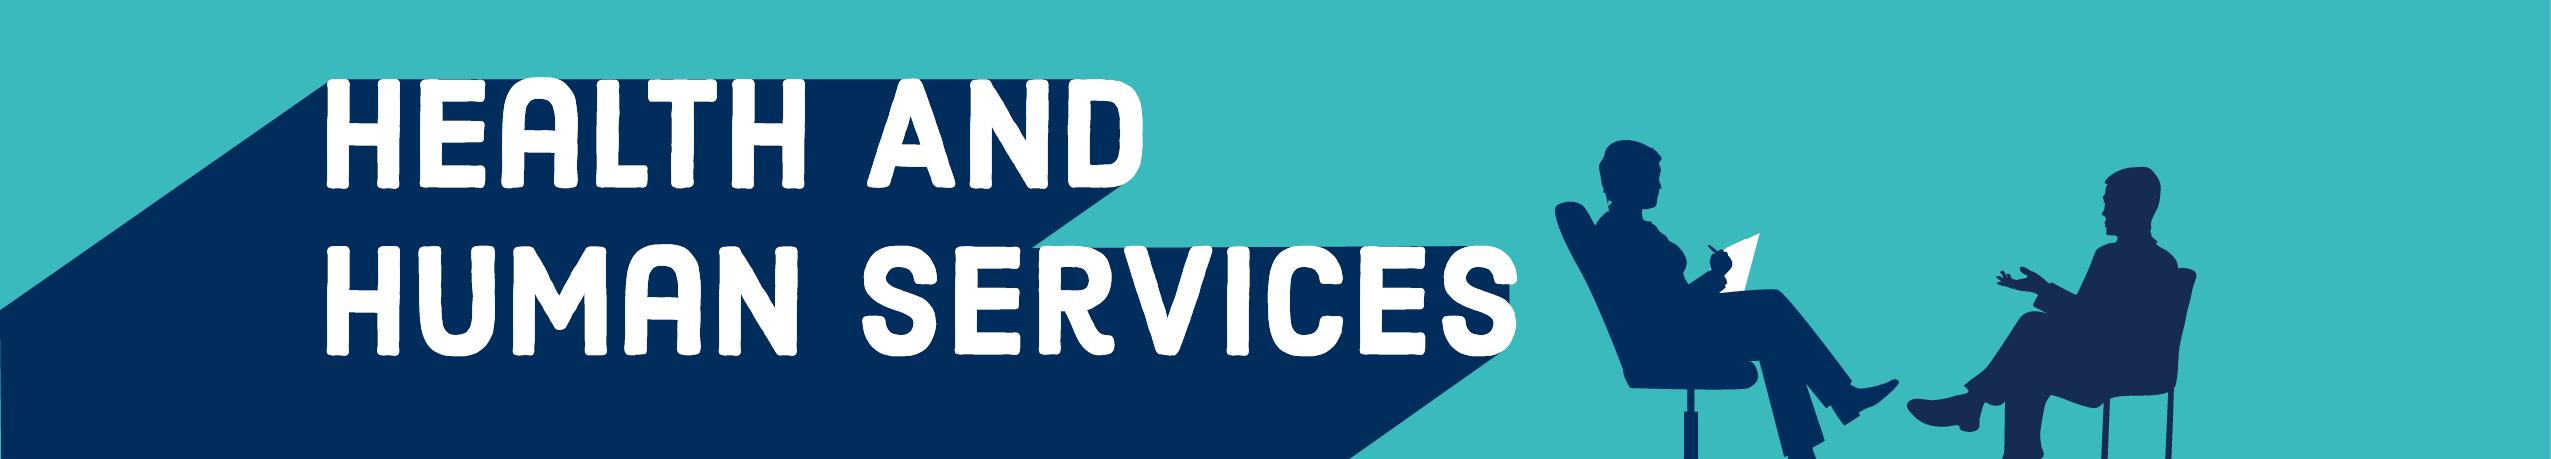 health-human-services